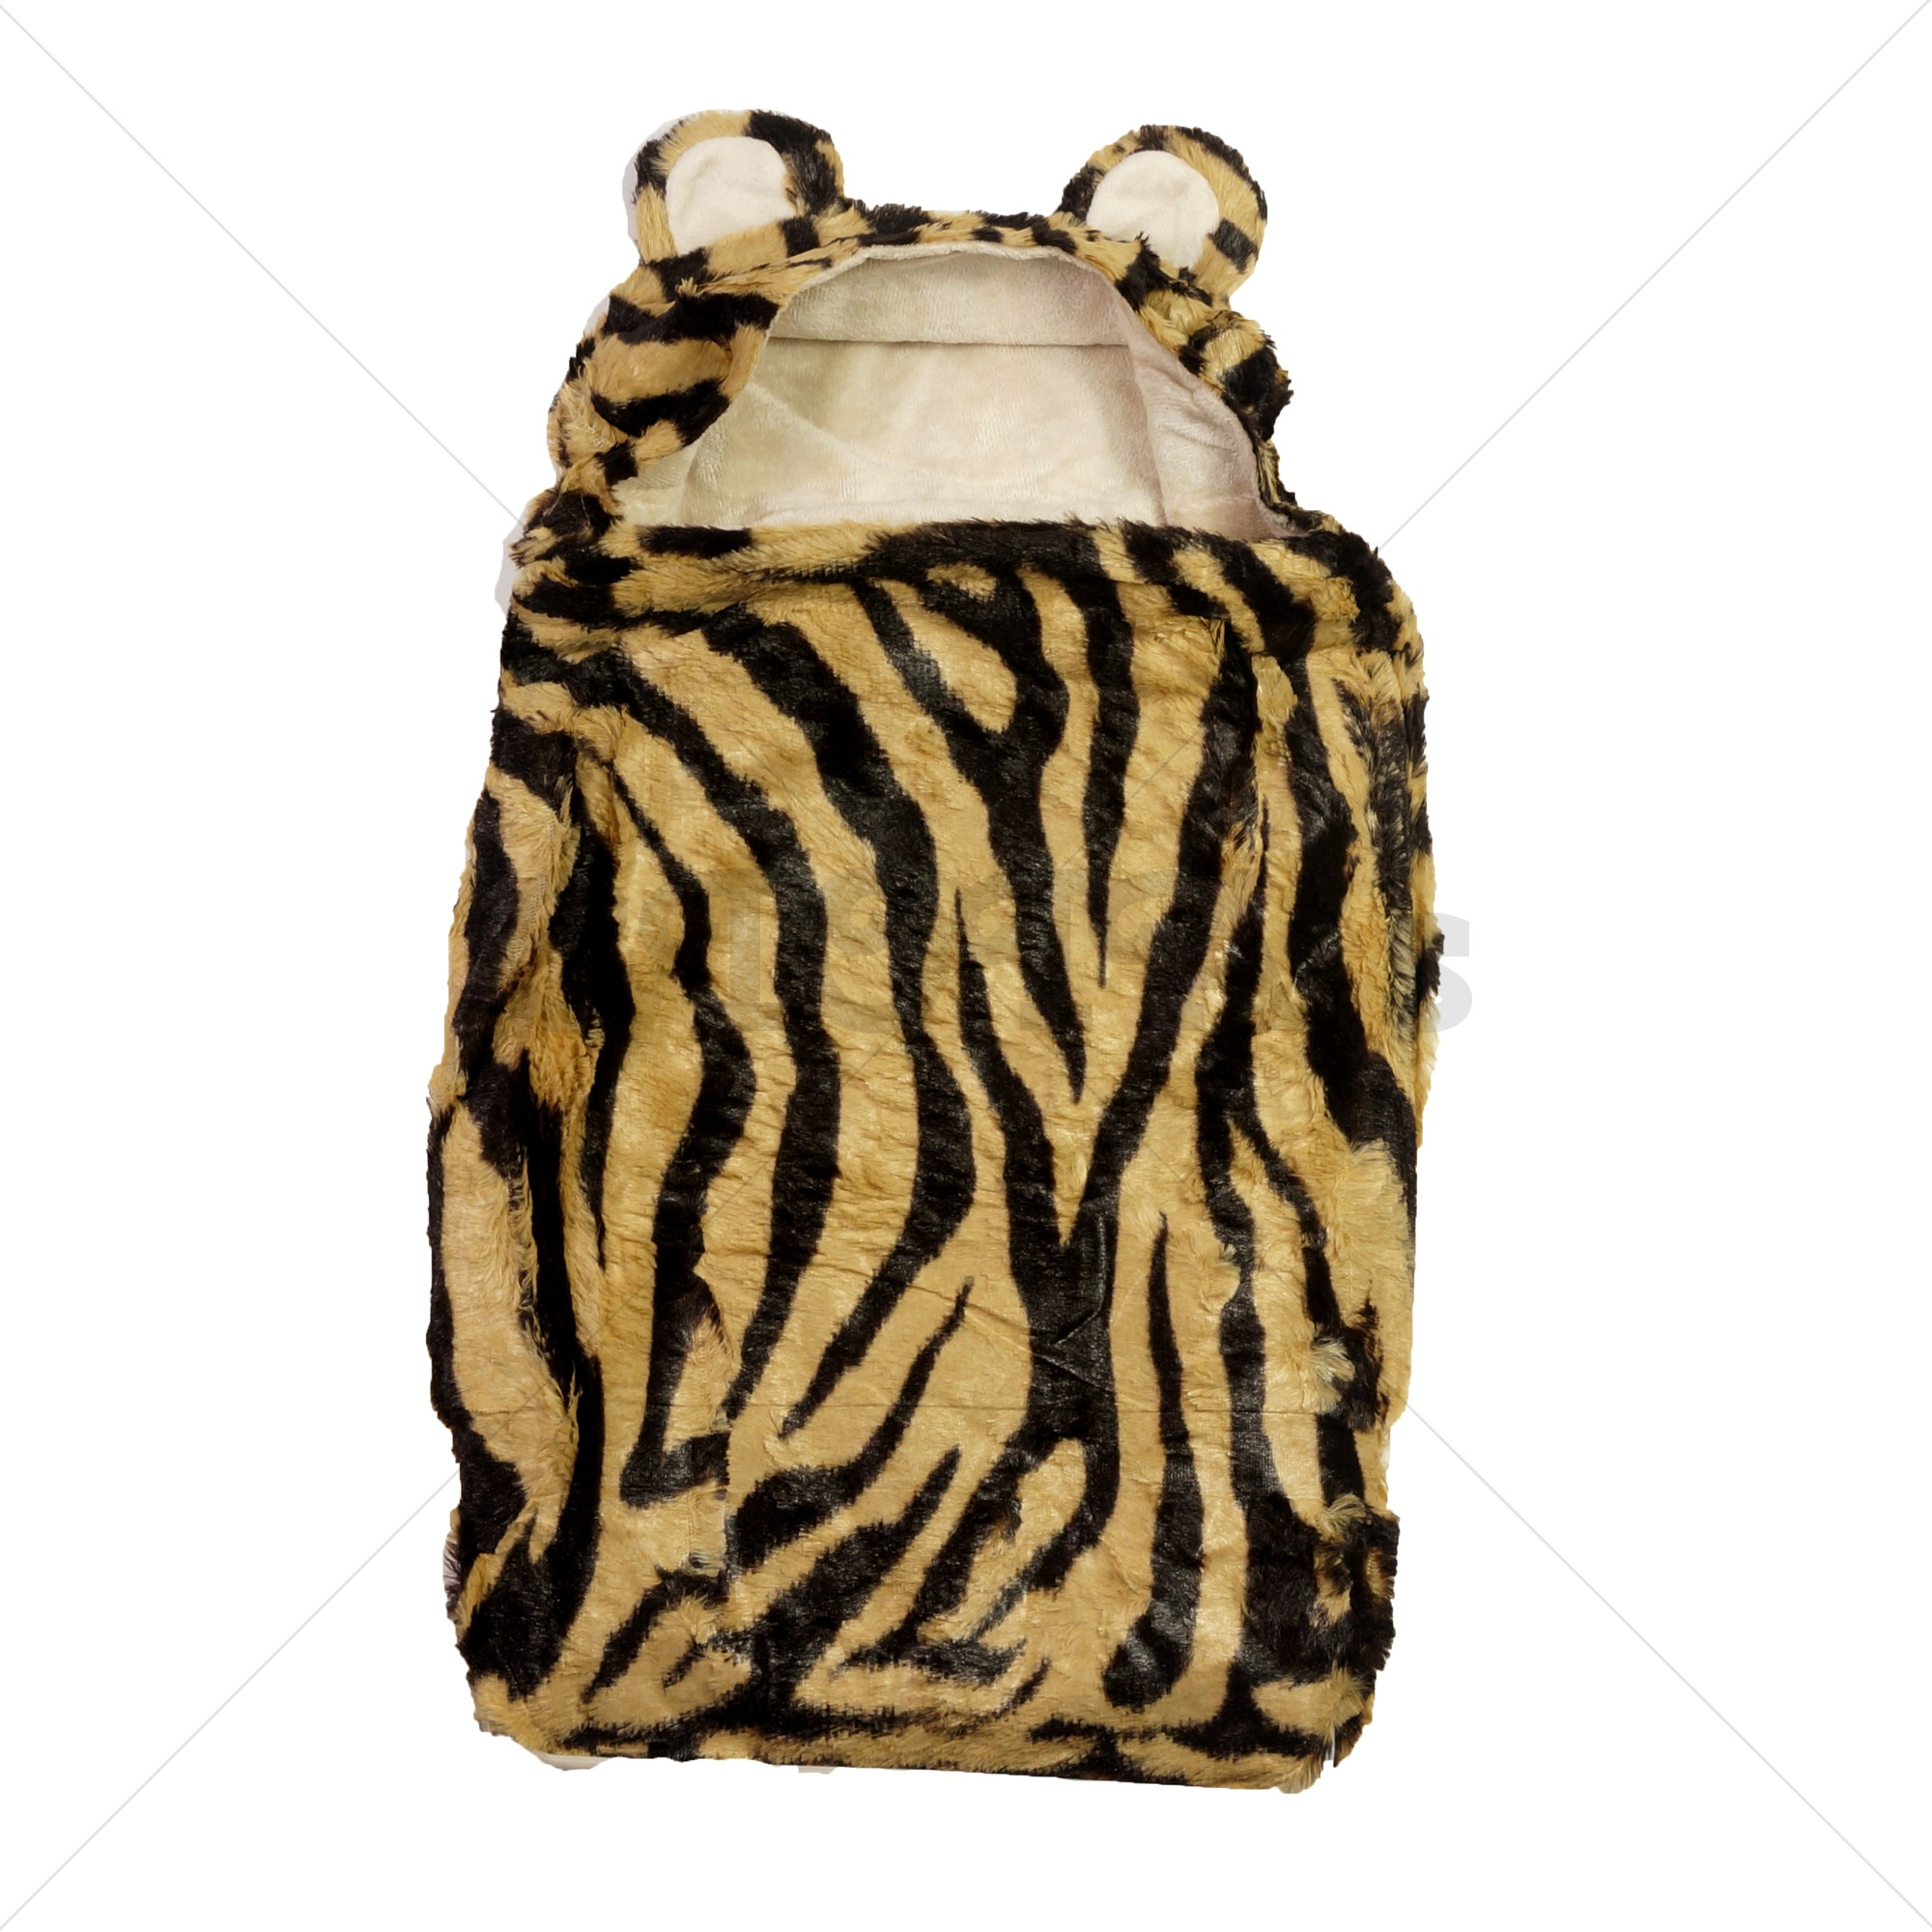 Soft Touch wikkeldoek / omslagdeken tijgerprint/beige